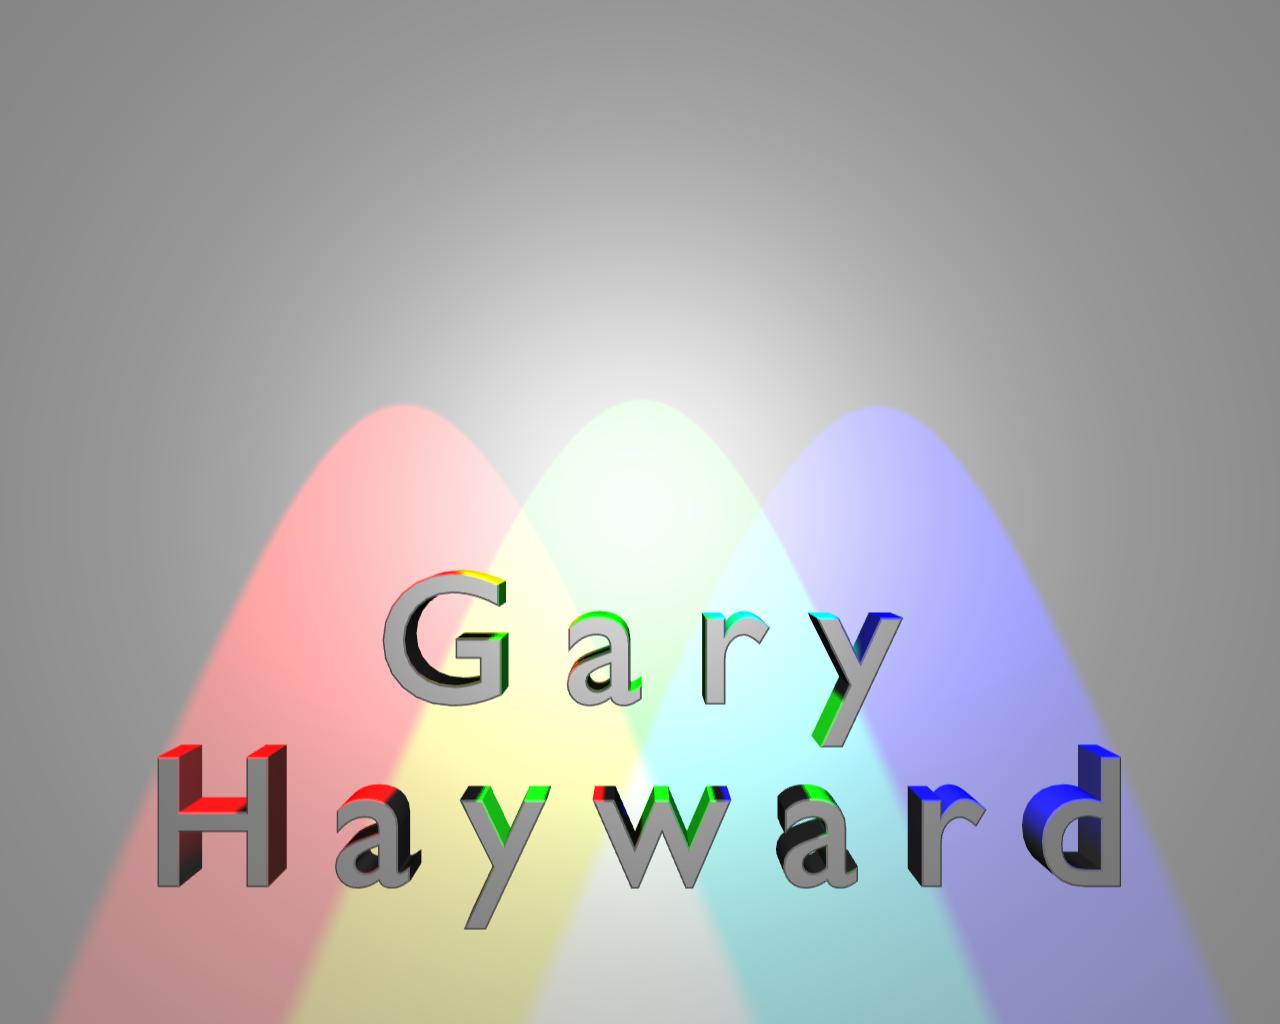 my_tri_spotlights_gary_hayward_myspace2_01.blend.no_s_01.w_c_01.no_h.sun1.0.png (1280×1024) [3D text]